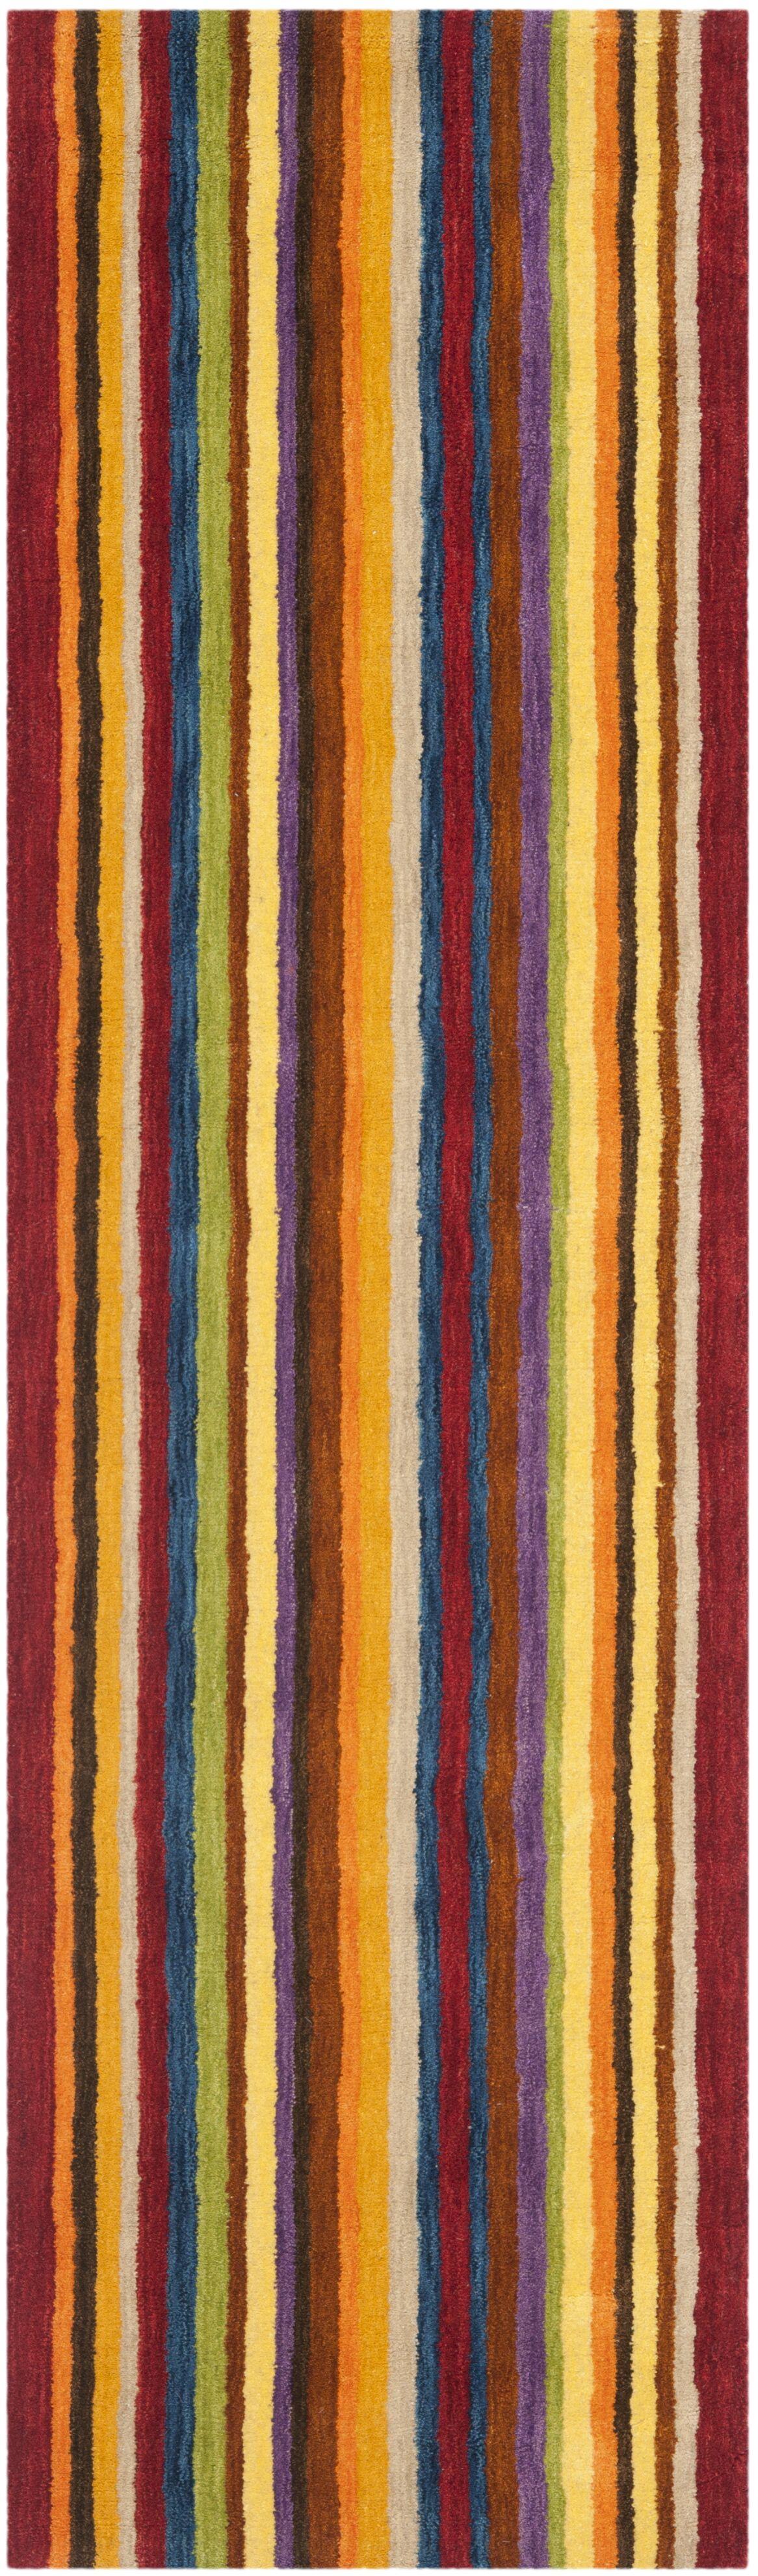 Bolick Hand Woven Wool Yellow/Brown/Orange Area Rug Rug Size: Runner 2'3